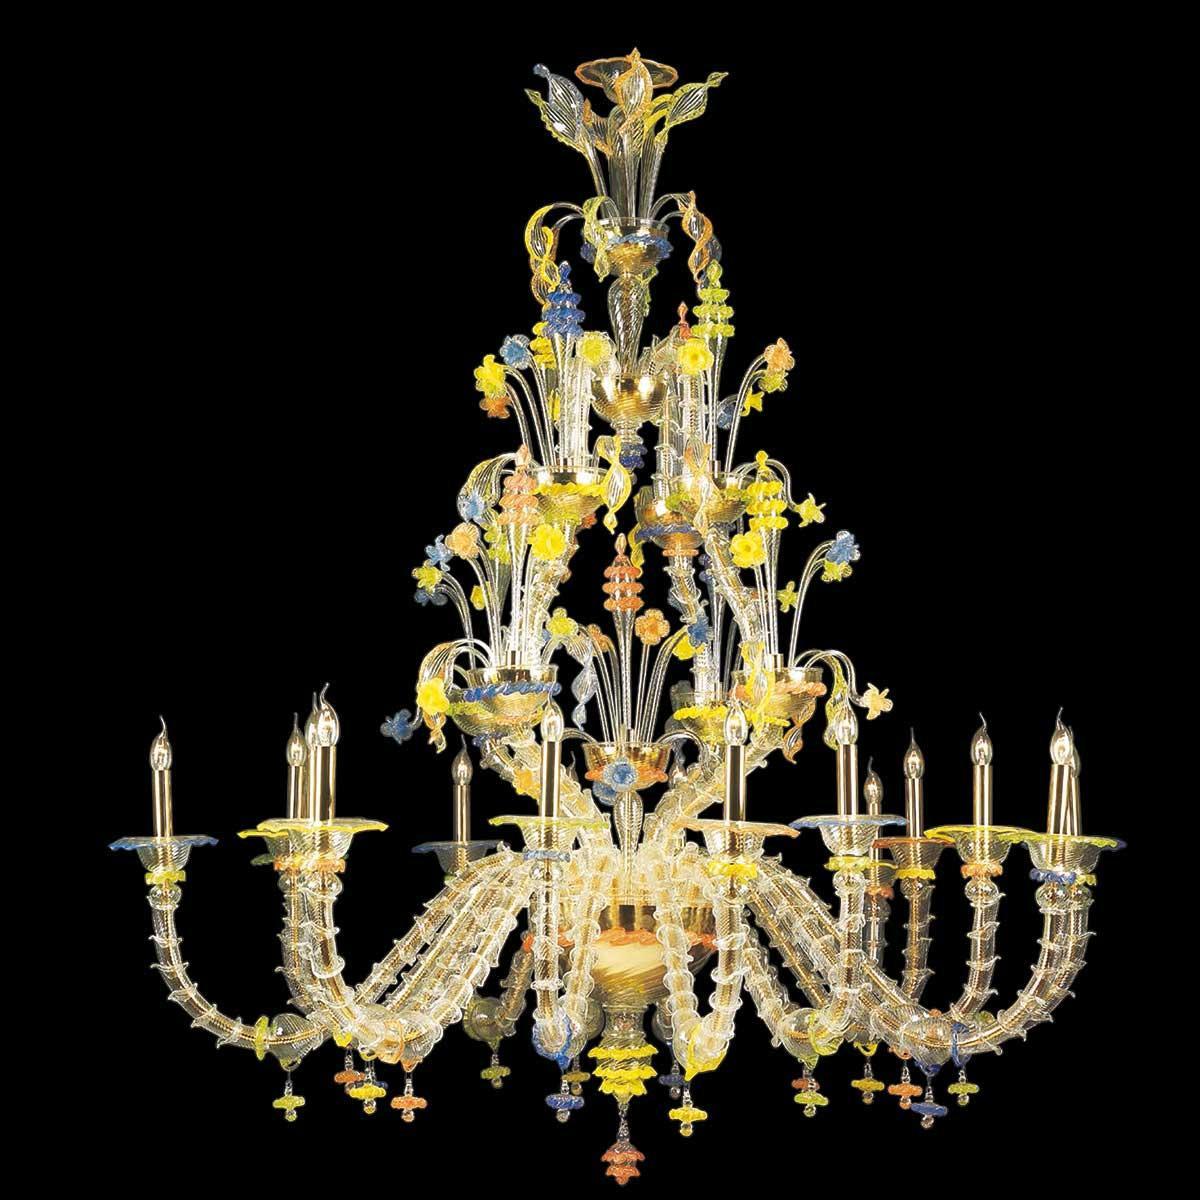 """Carlotta"" Murano glas Kronleuchter - 8+8 flammig - transparent, multicolor und gold"